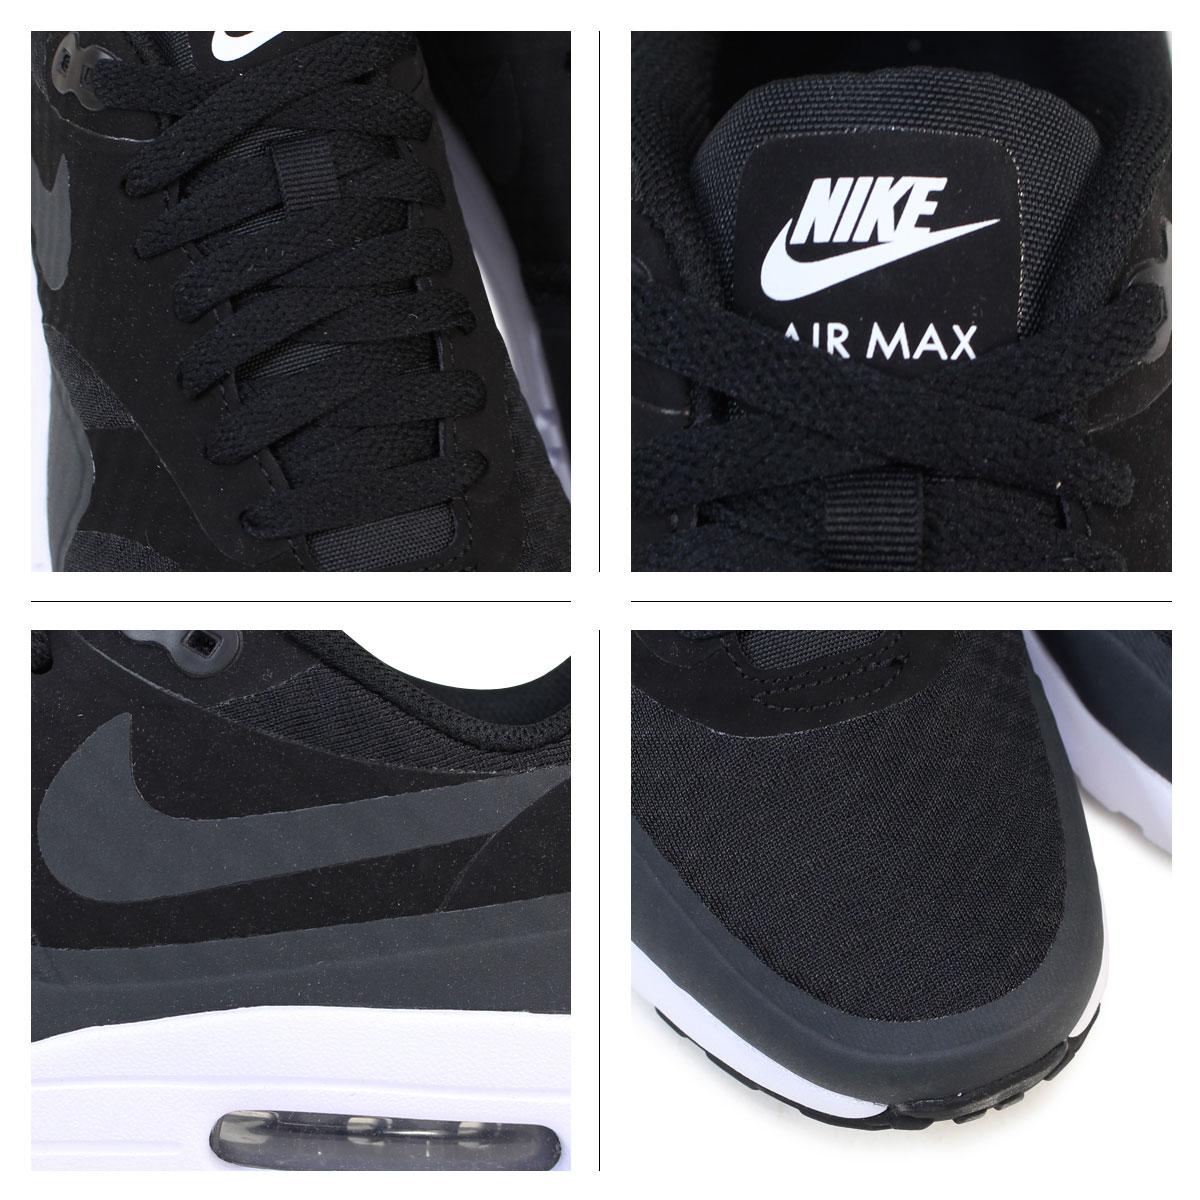 NIKE Kie Ney AMAX men sneakers AIR MAX 1 ULTRA ESSENTIAL 819,476 004 819,476 105 shoes black black white white